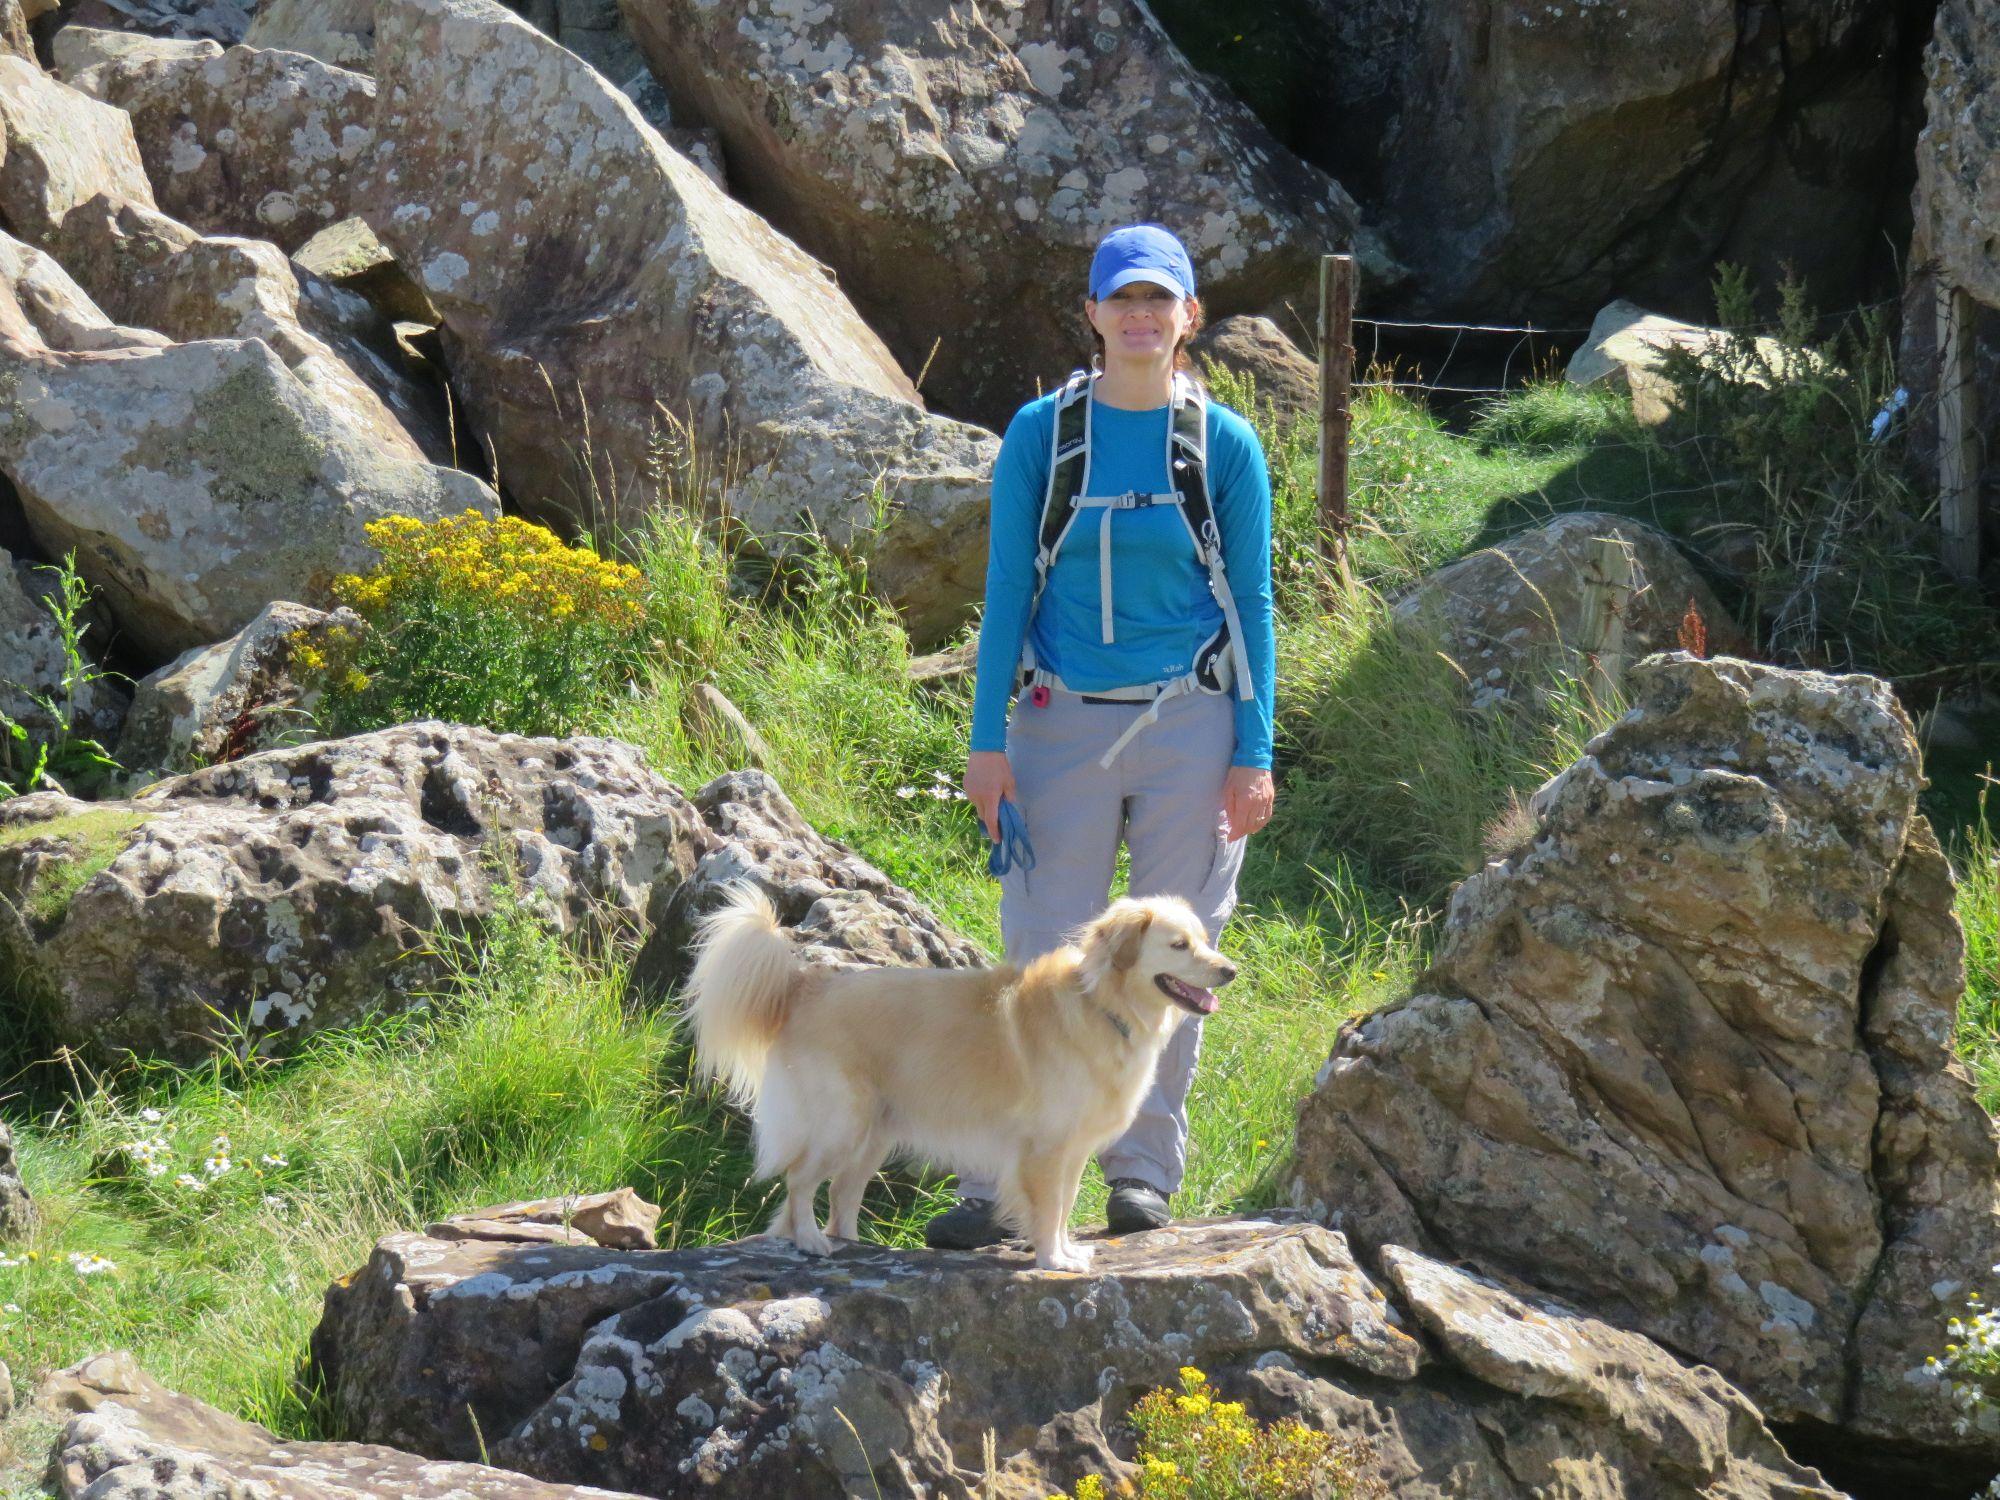 dawn and her dog sandy hiking